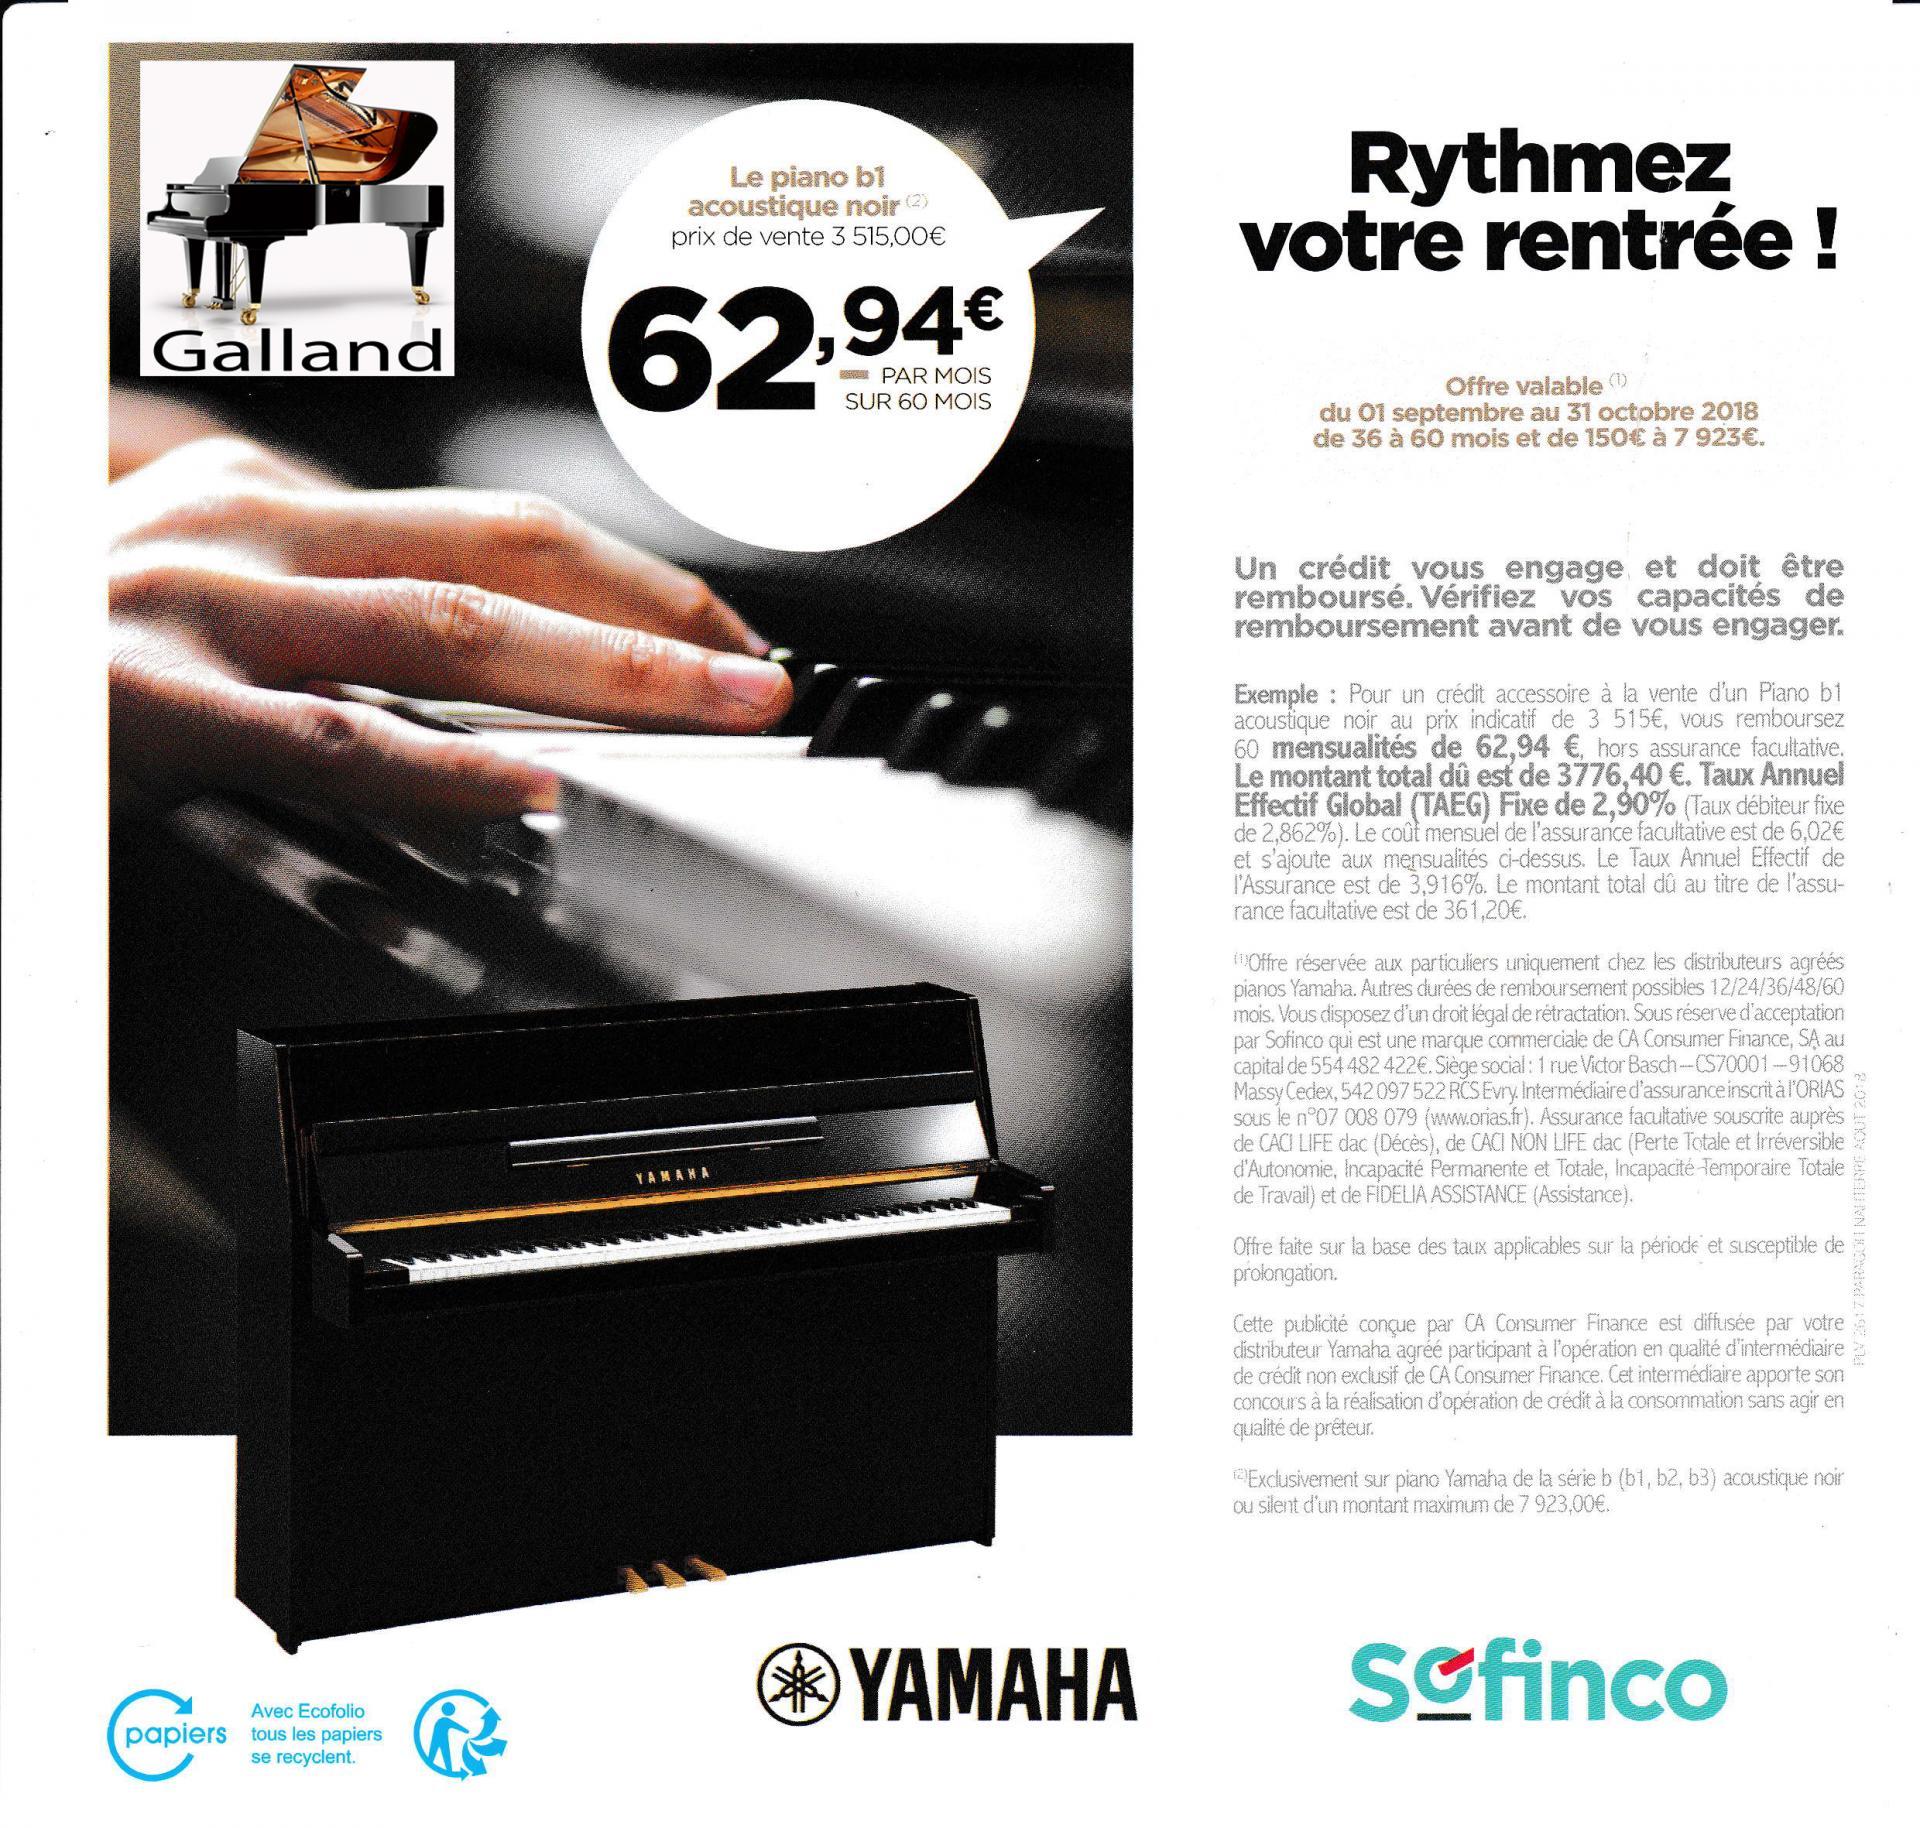 Yamaha b1 60 mois 2018